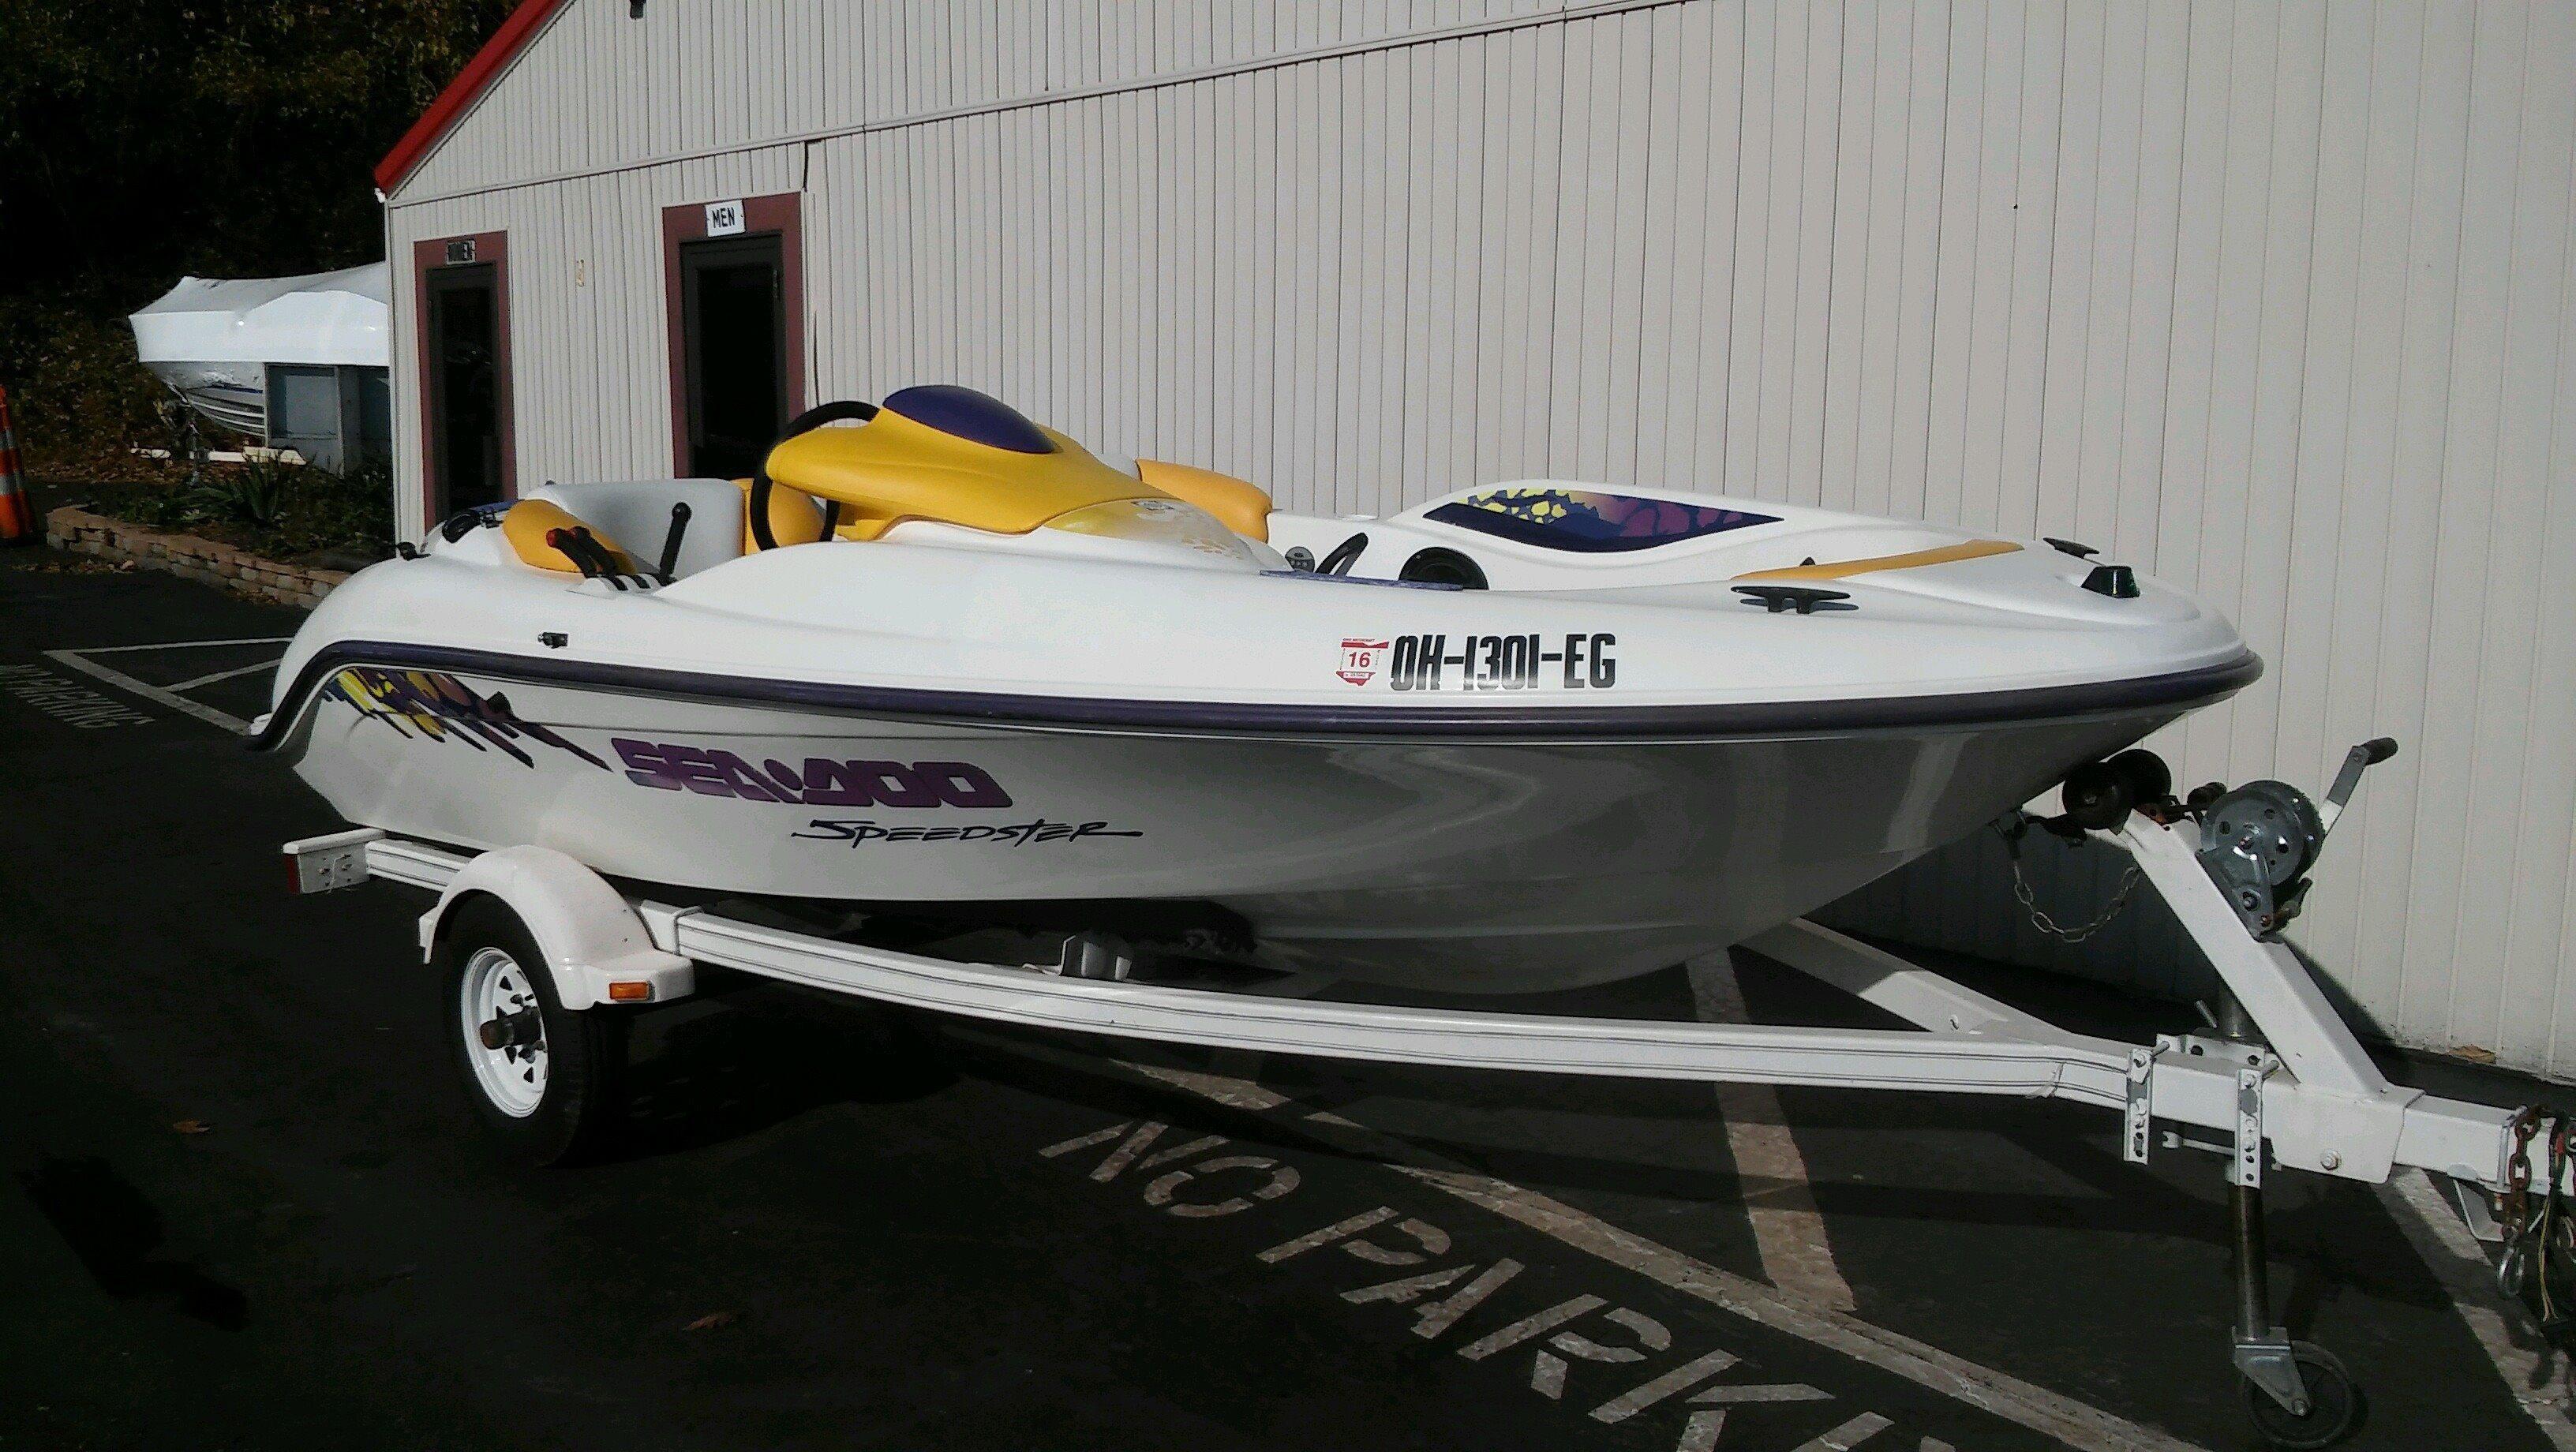 1996 Sea-Doo Speedster Power Boat For Sale - www ...